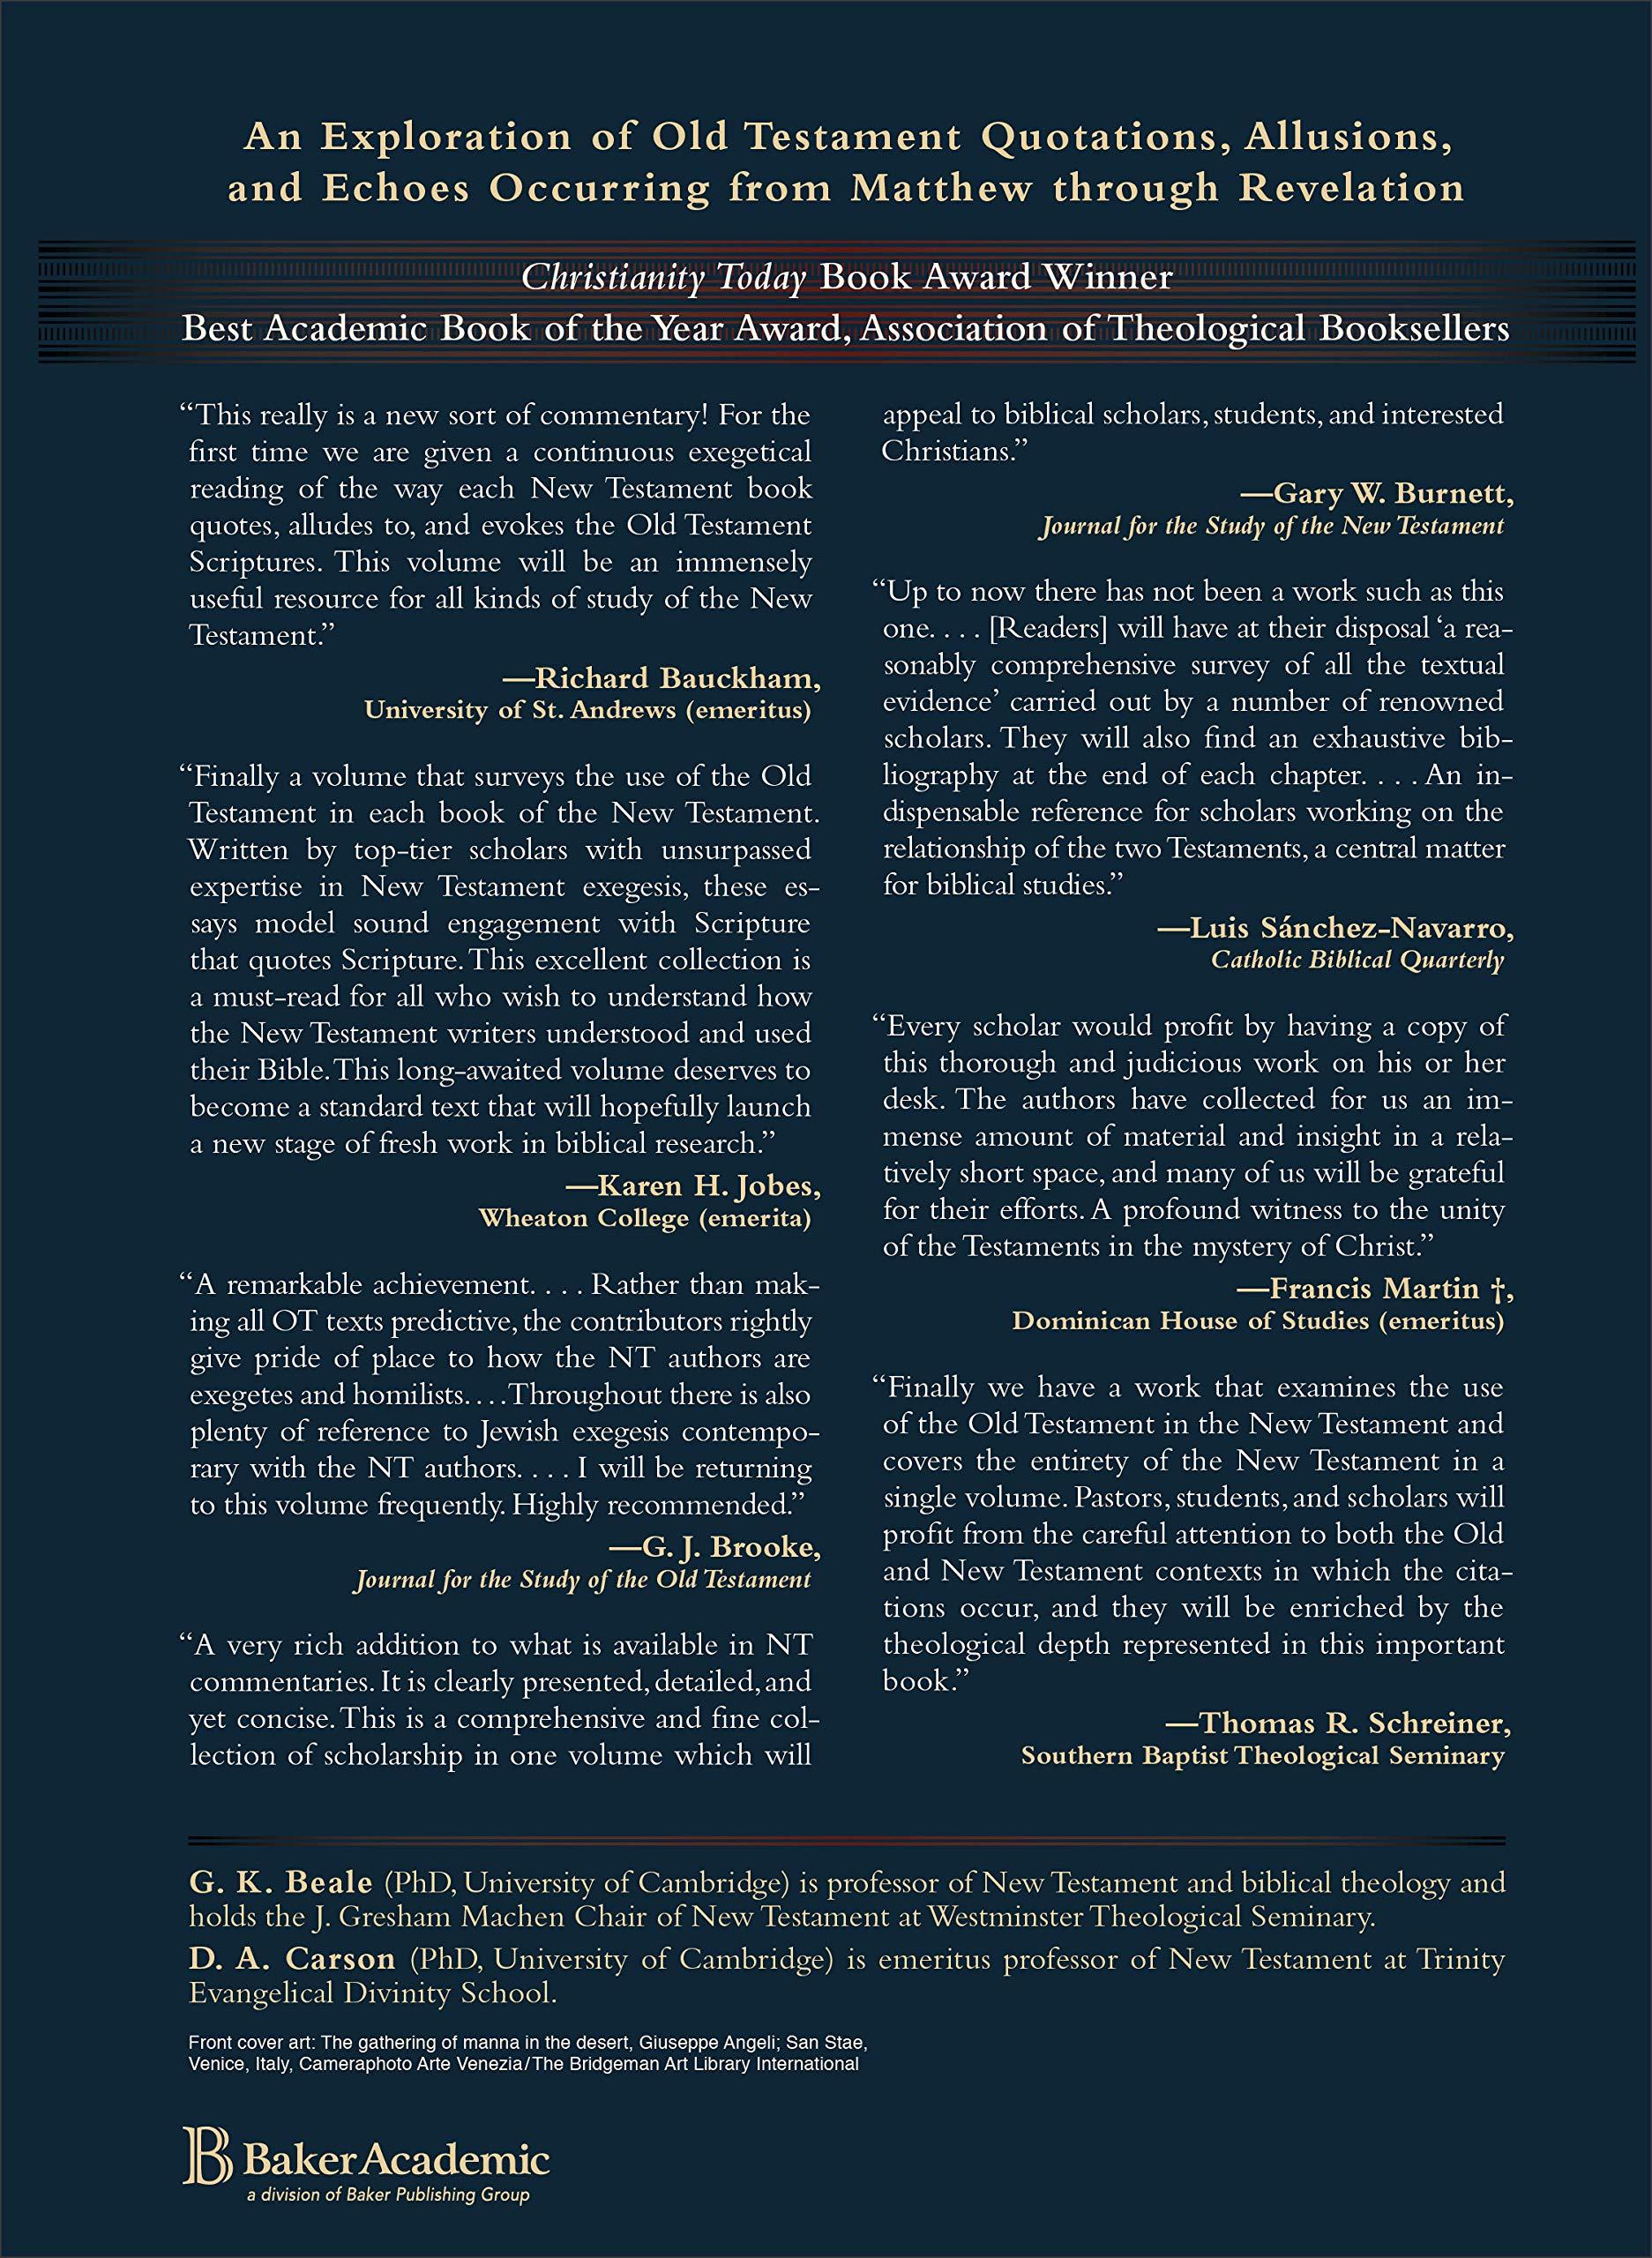 Jesus' References to Old Testament Scriptures